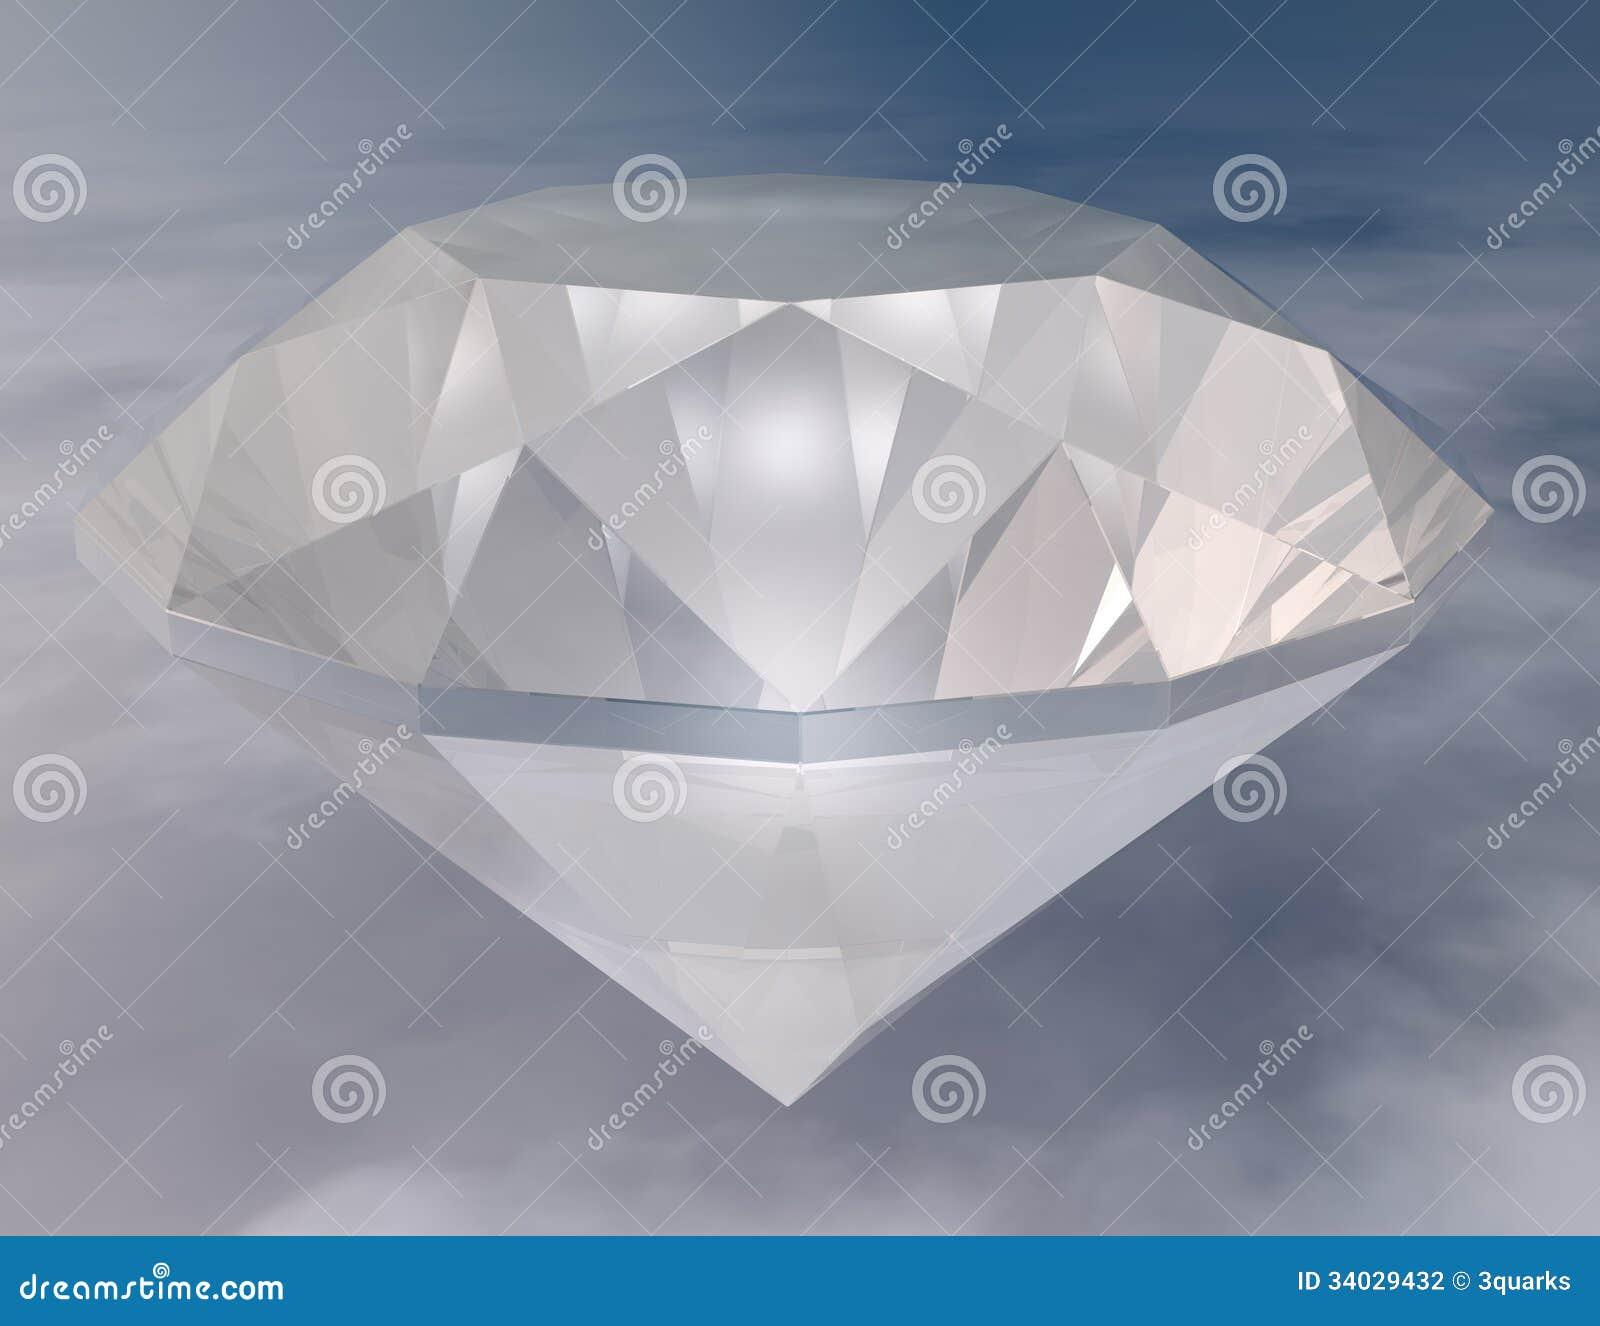 Download Diamond stock illustration. Illustration of photorealistic - 34029432